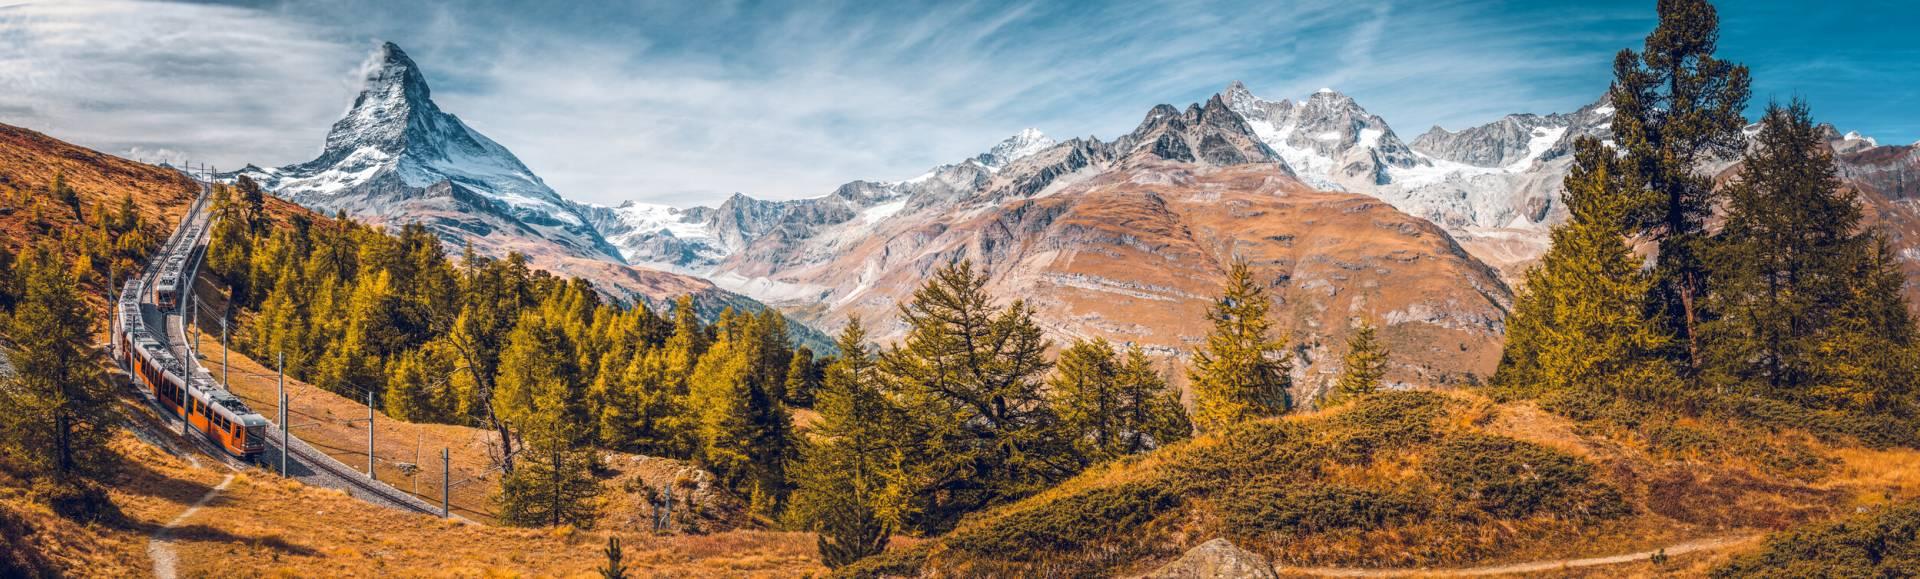 Autumn on the Gornergrat, between the stations Riffelalp and Riffelberg, Zermatt, Switzerland